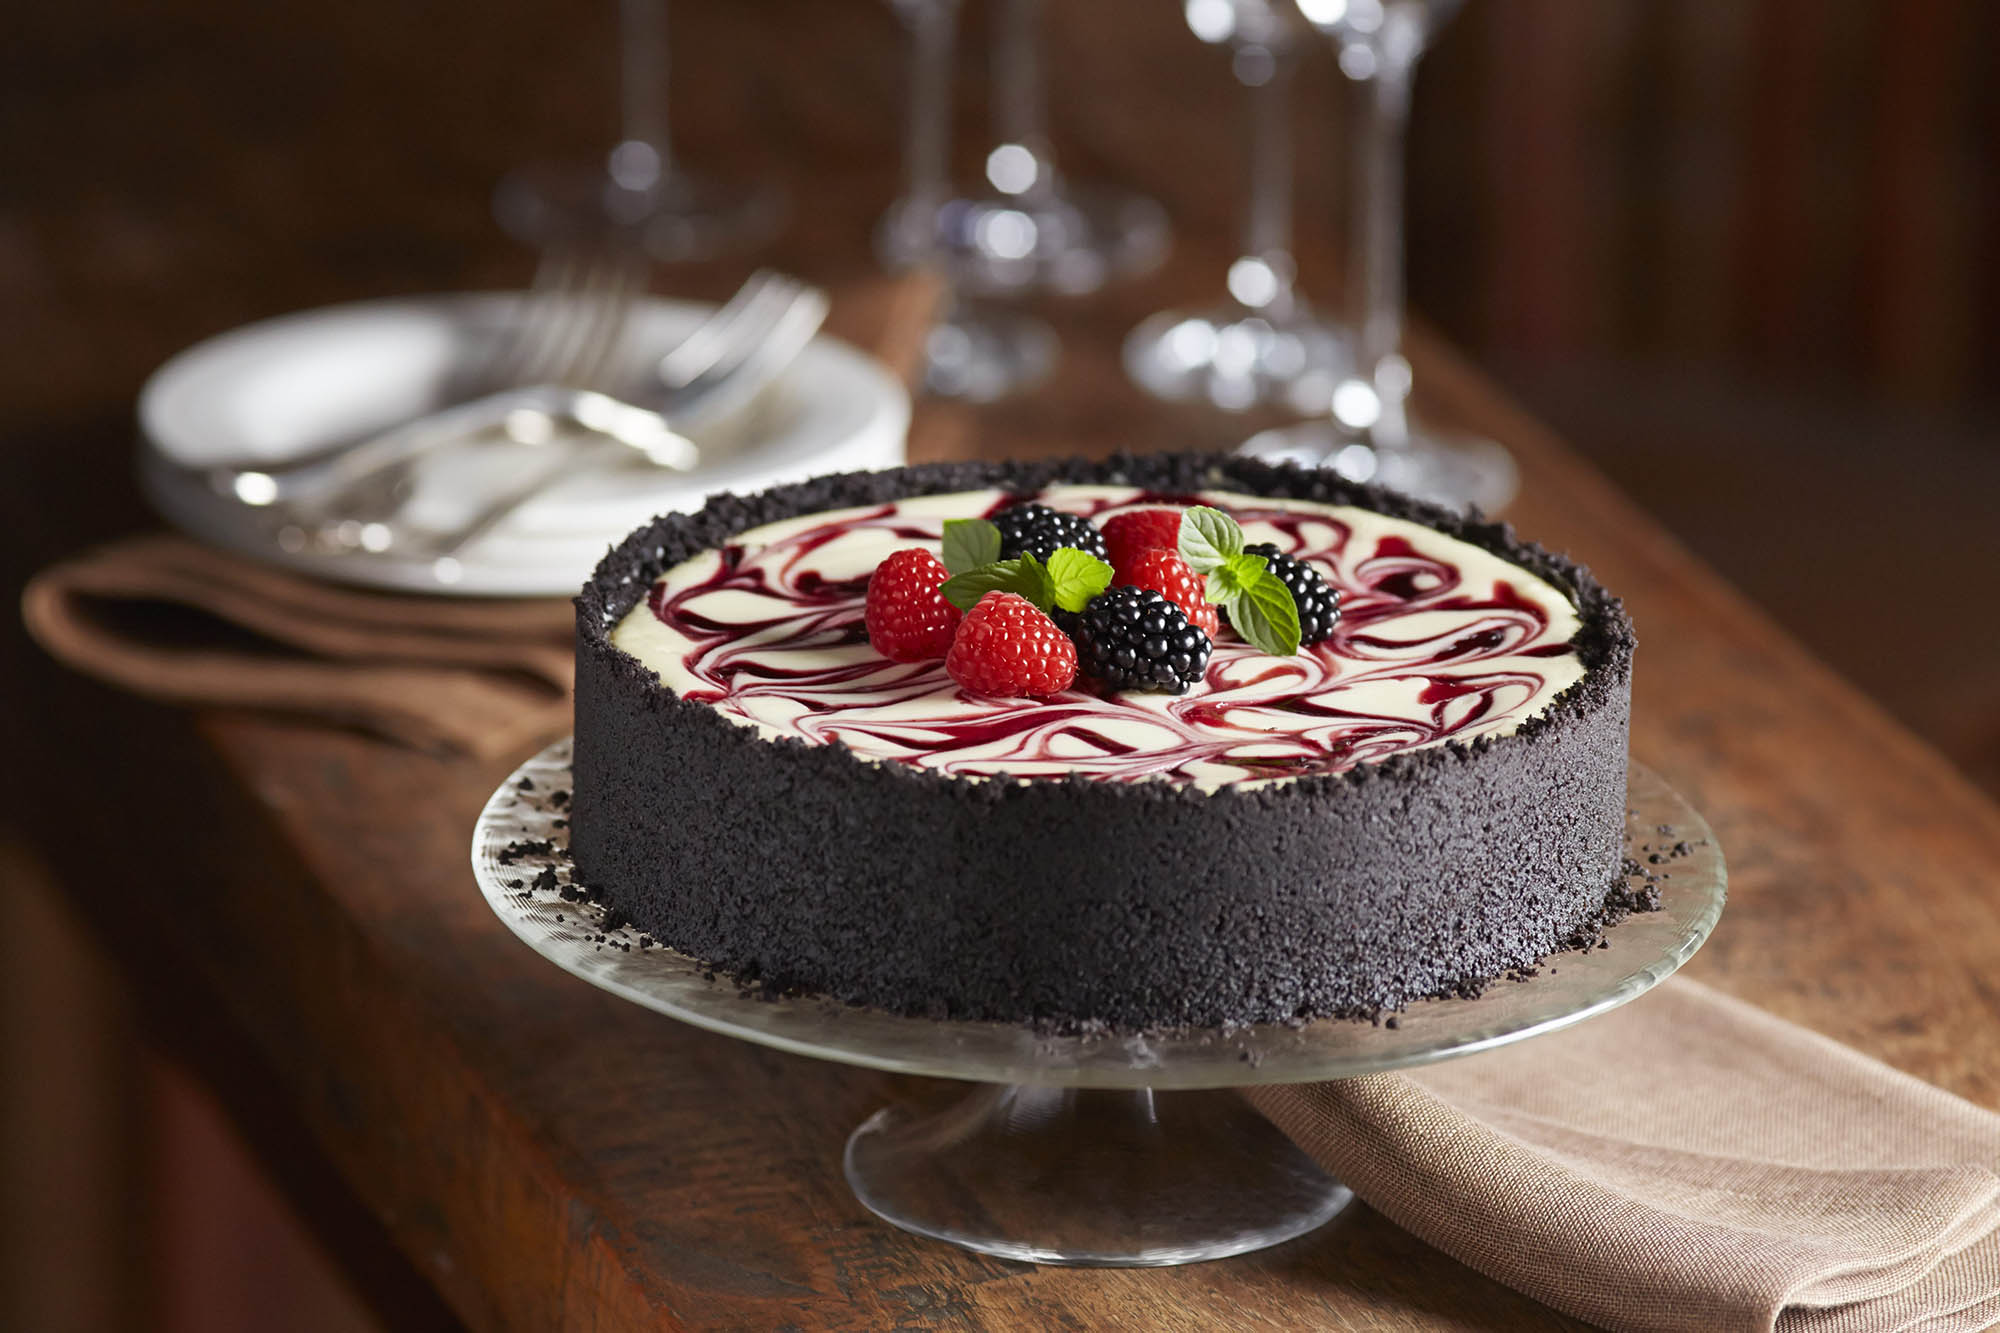 Blackberry And Raspberry Swirl Cheesecake Driscolls,Kitchen Small House Renovation Ideas